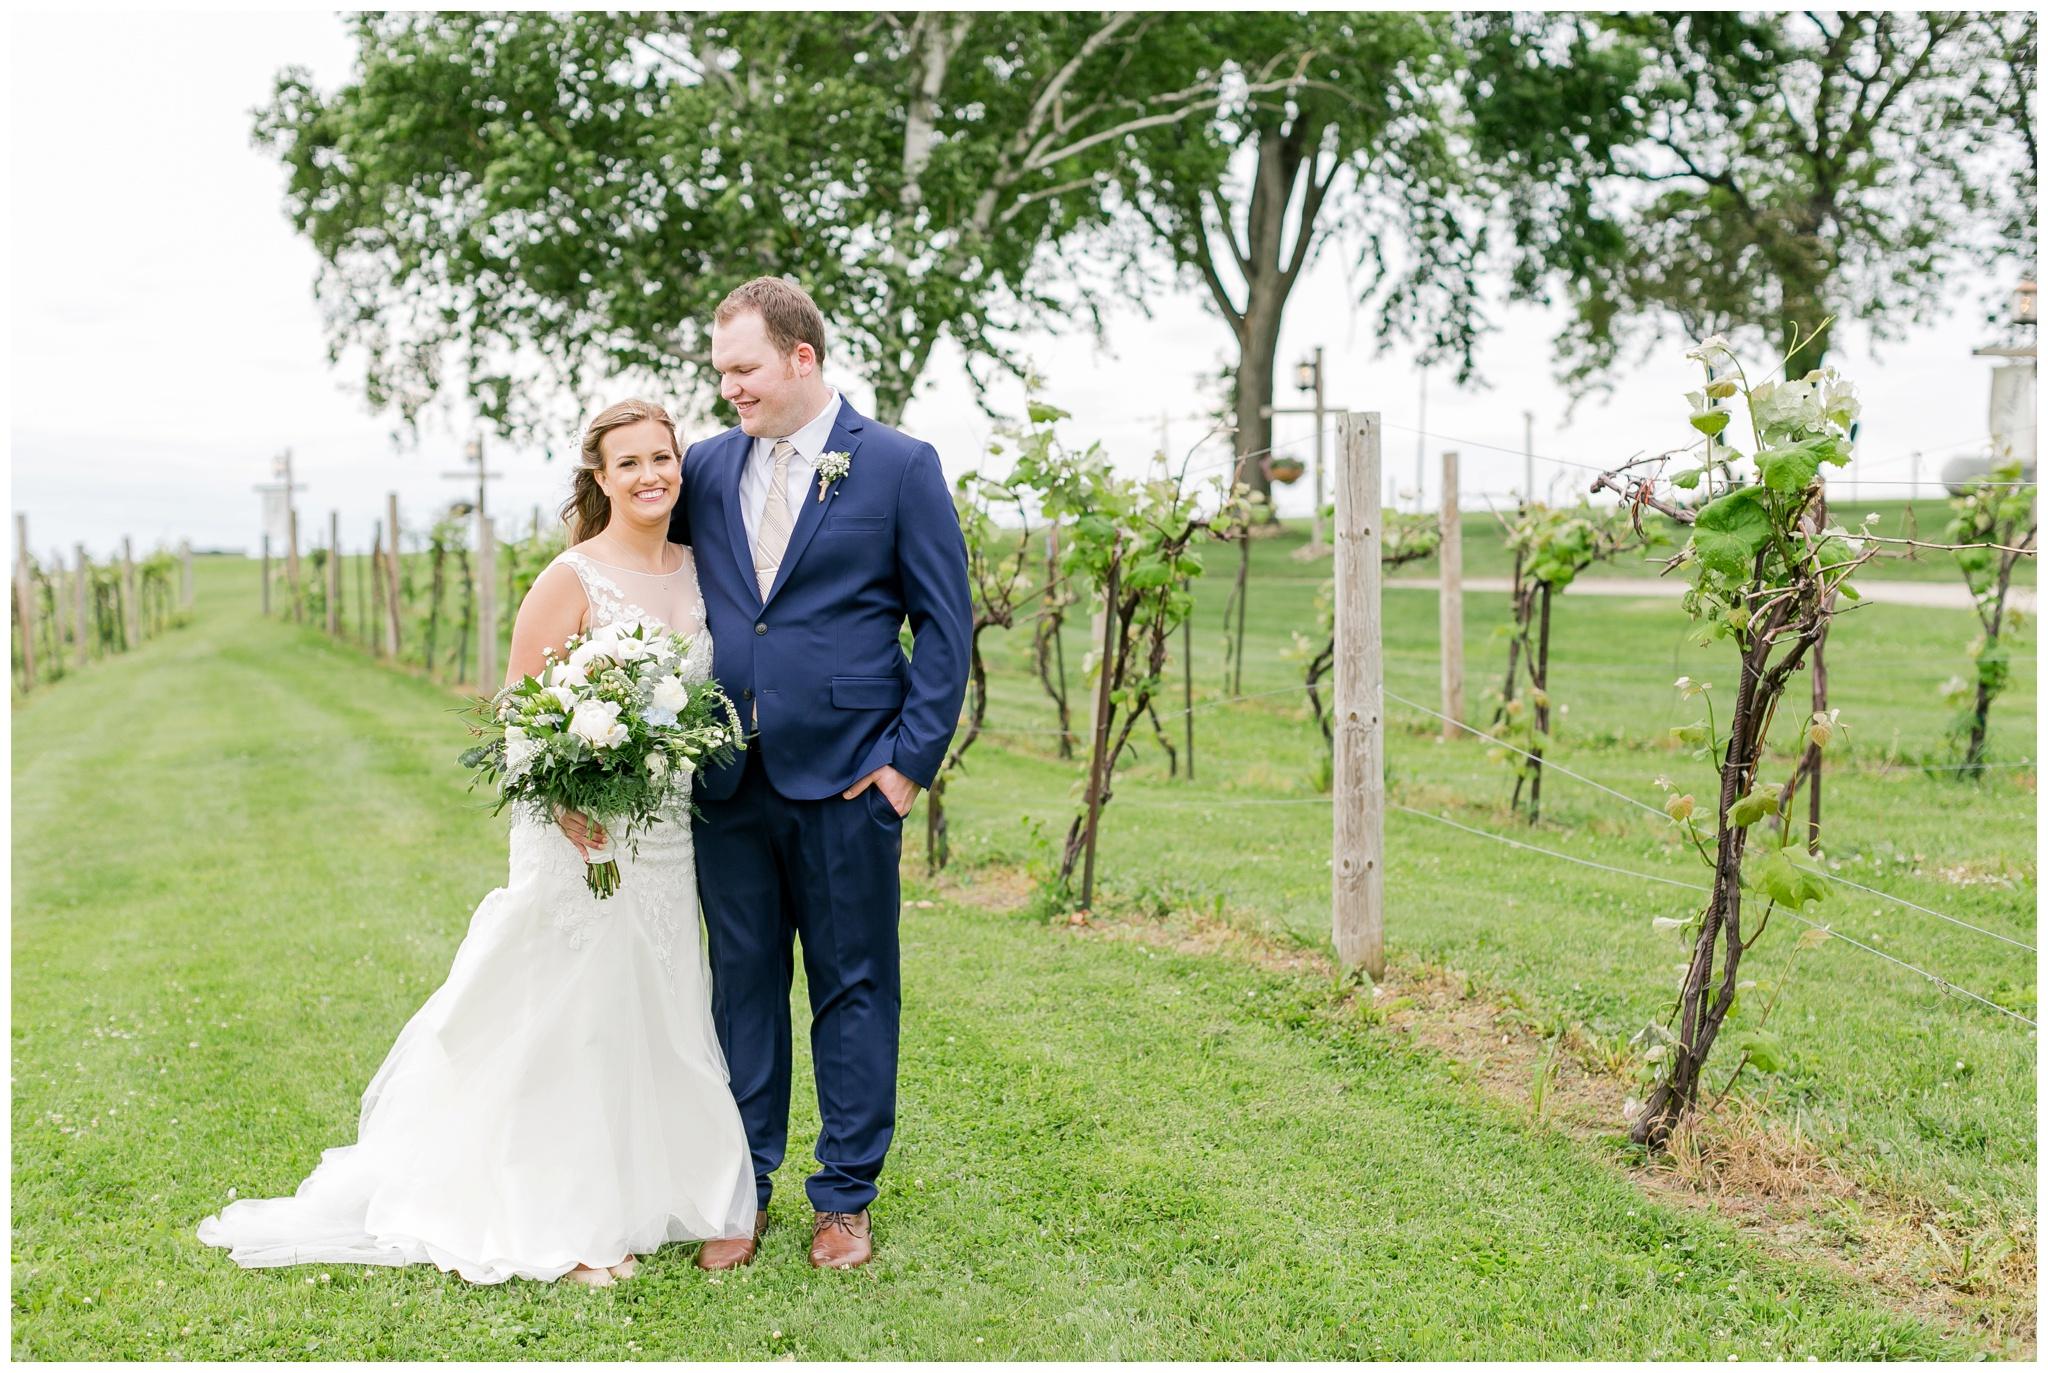 over_the_vines_wedding_edgerton_wisconsin_wedding_caynay_photo_4012.jpg